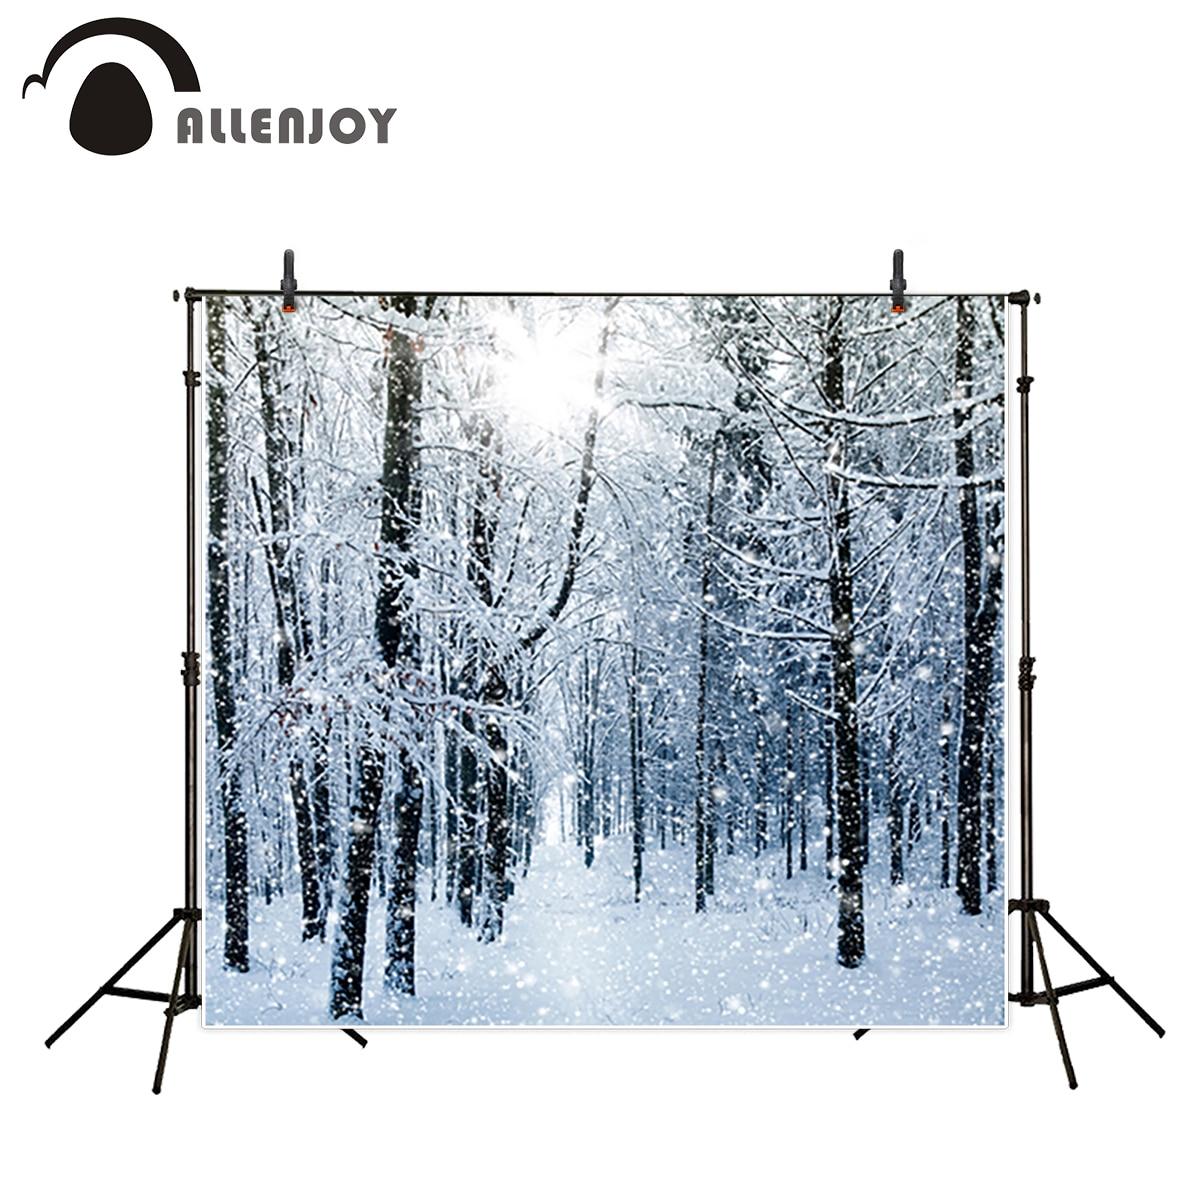 Allenjoy photography backdrop bokeh snow winter tree natual backgrounds photocall photo printer professional photocall защитный крем для рук атрикс купить